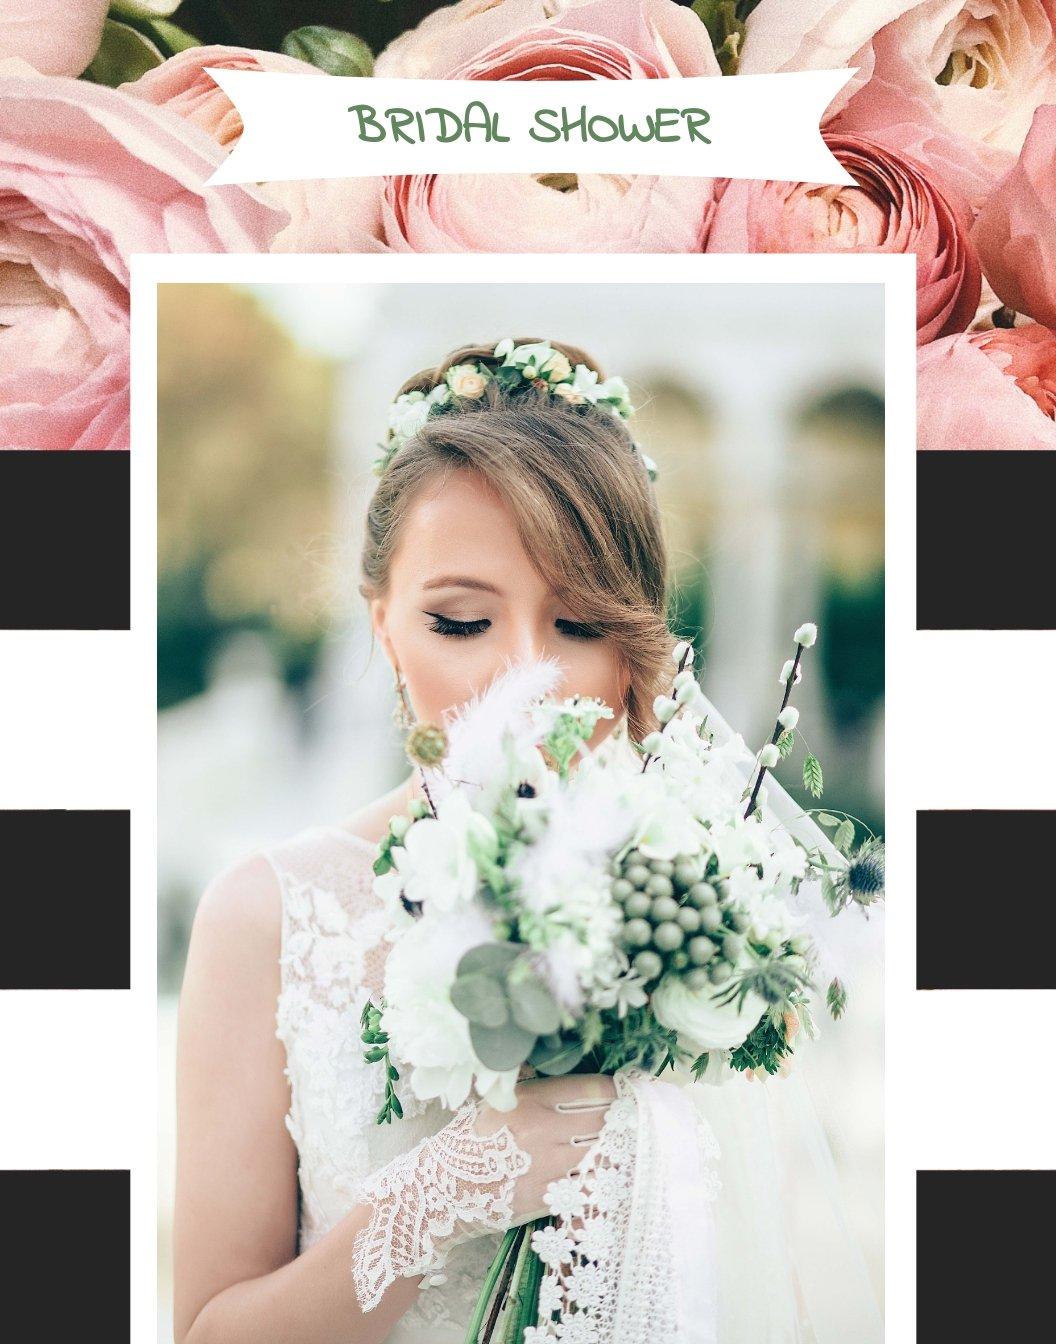 Bridal Shower Photo Frame Template